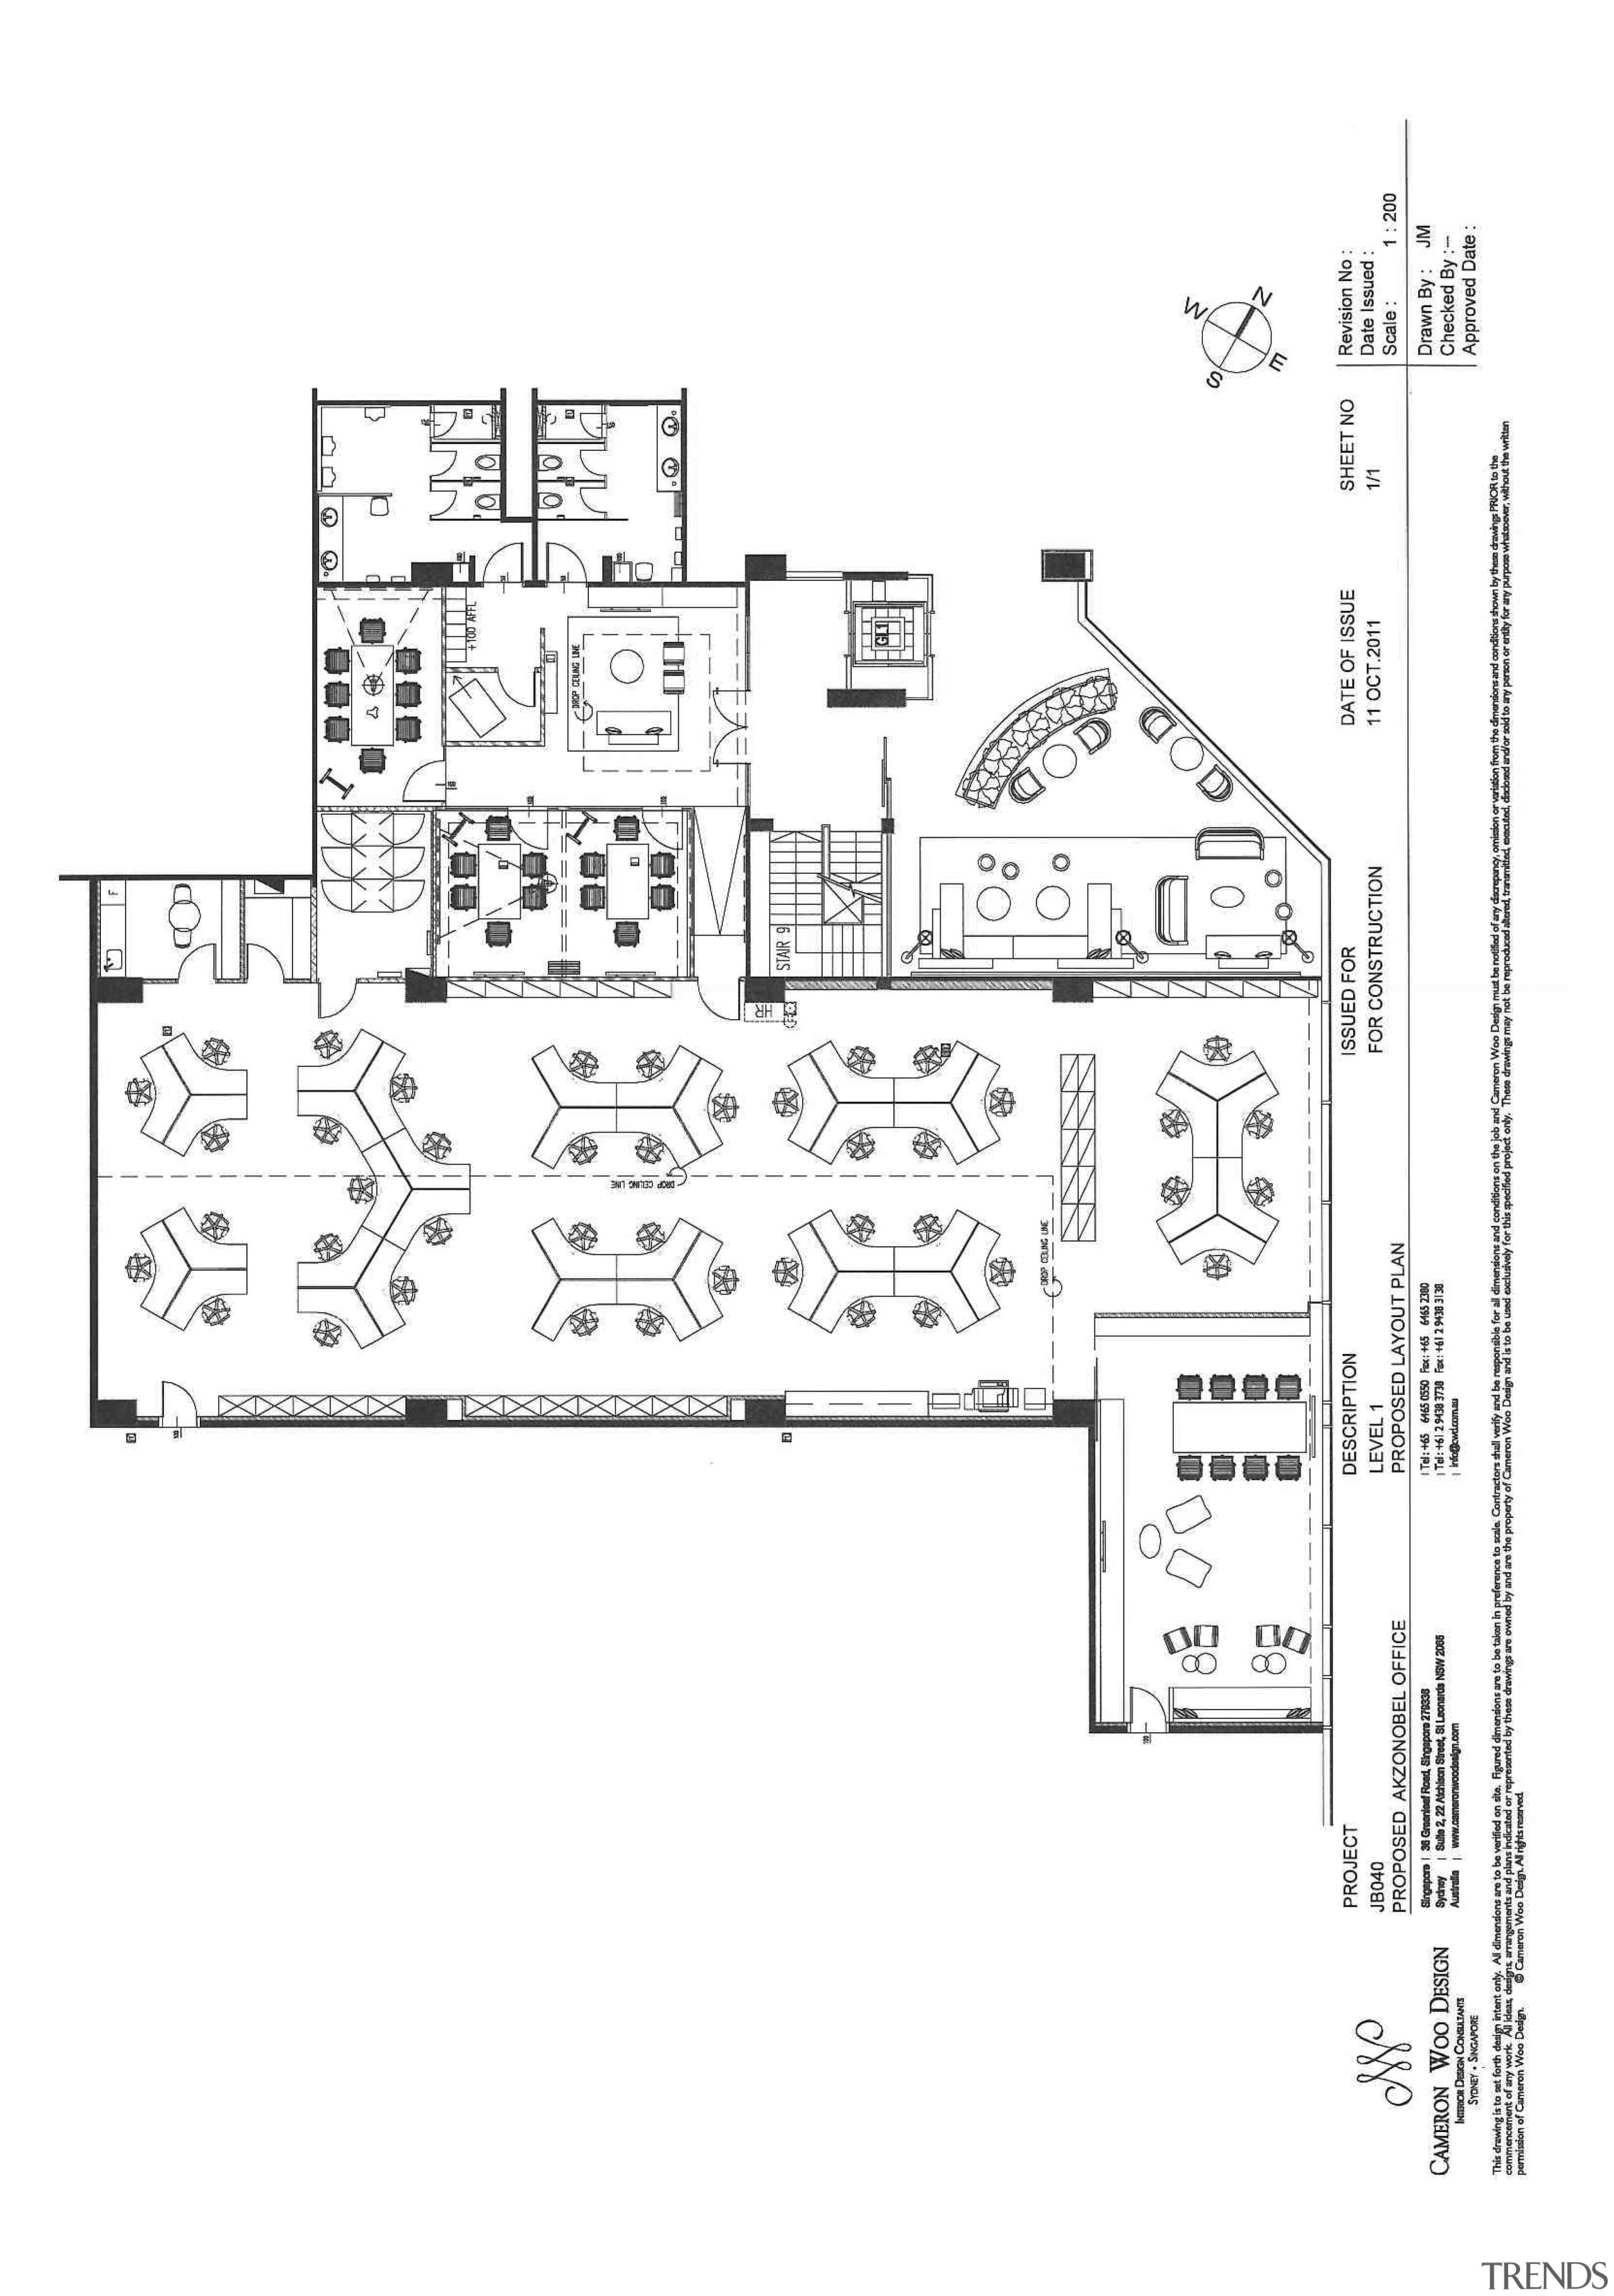 AkzoNobel House (Singapore) Interior design - AkzoNobel House area, artwork, black and white, design, diagram, drawing, floor plan, font, line, line art, plan, product design, schematic, technical drawing, text, white